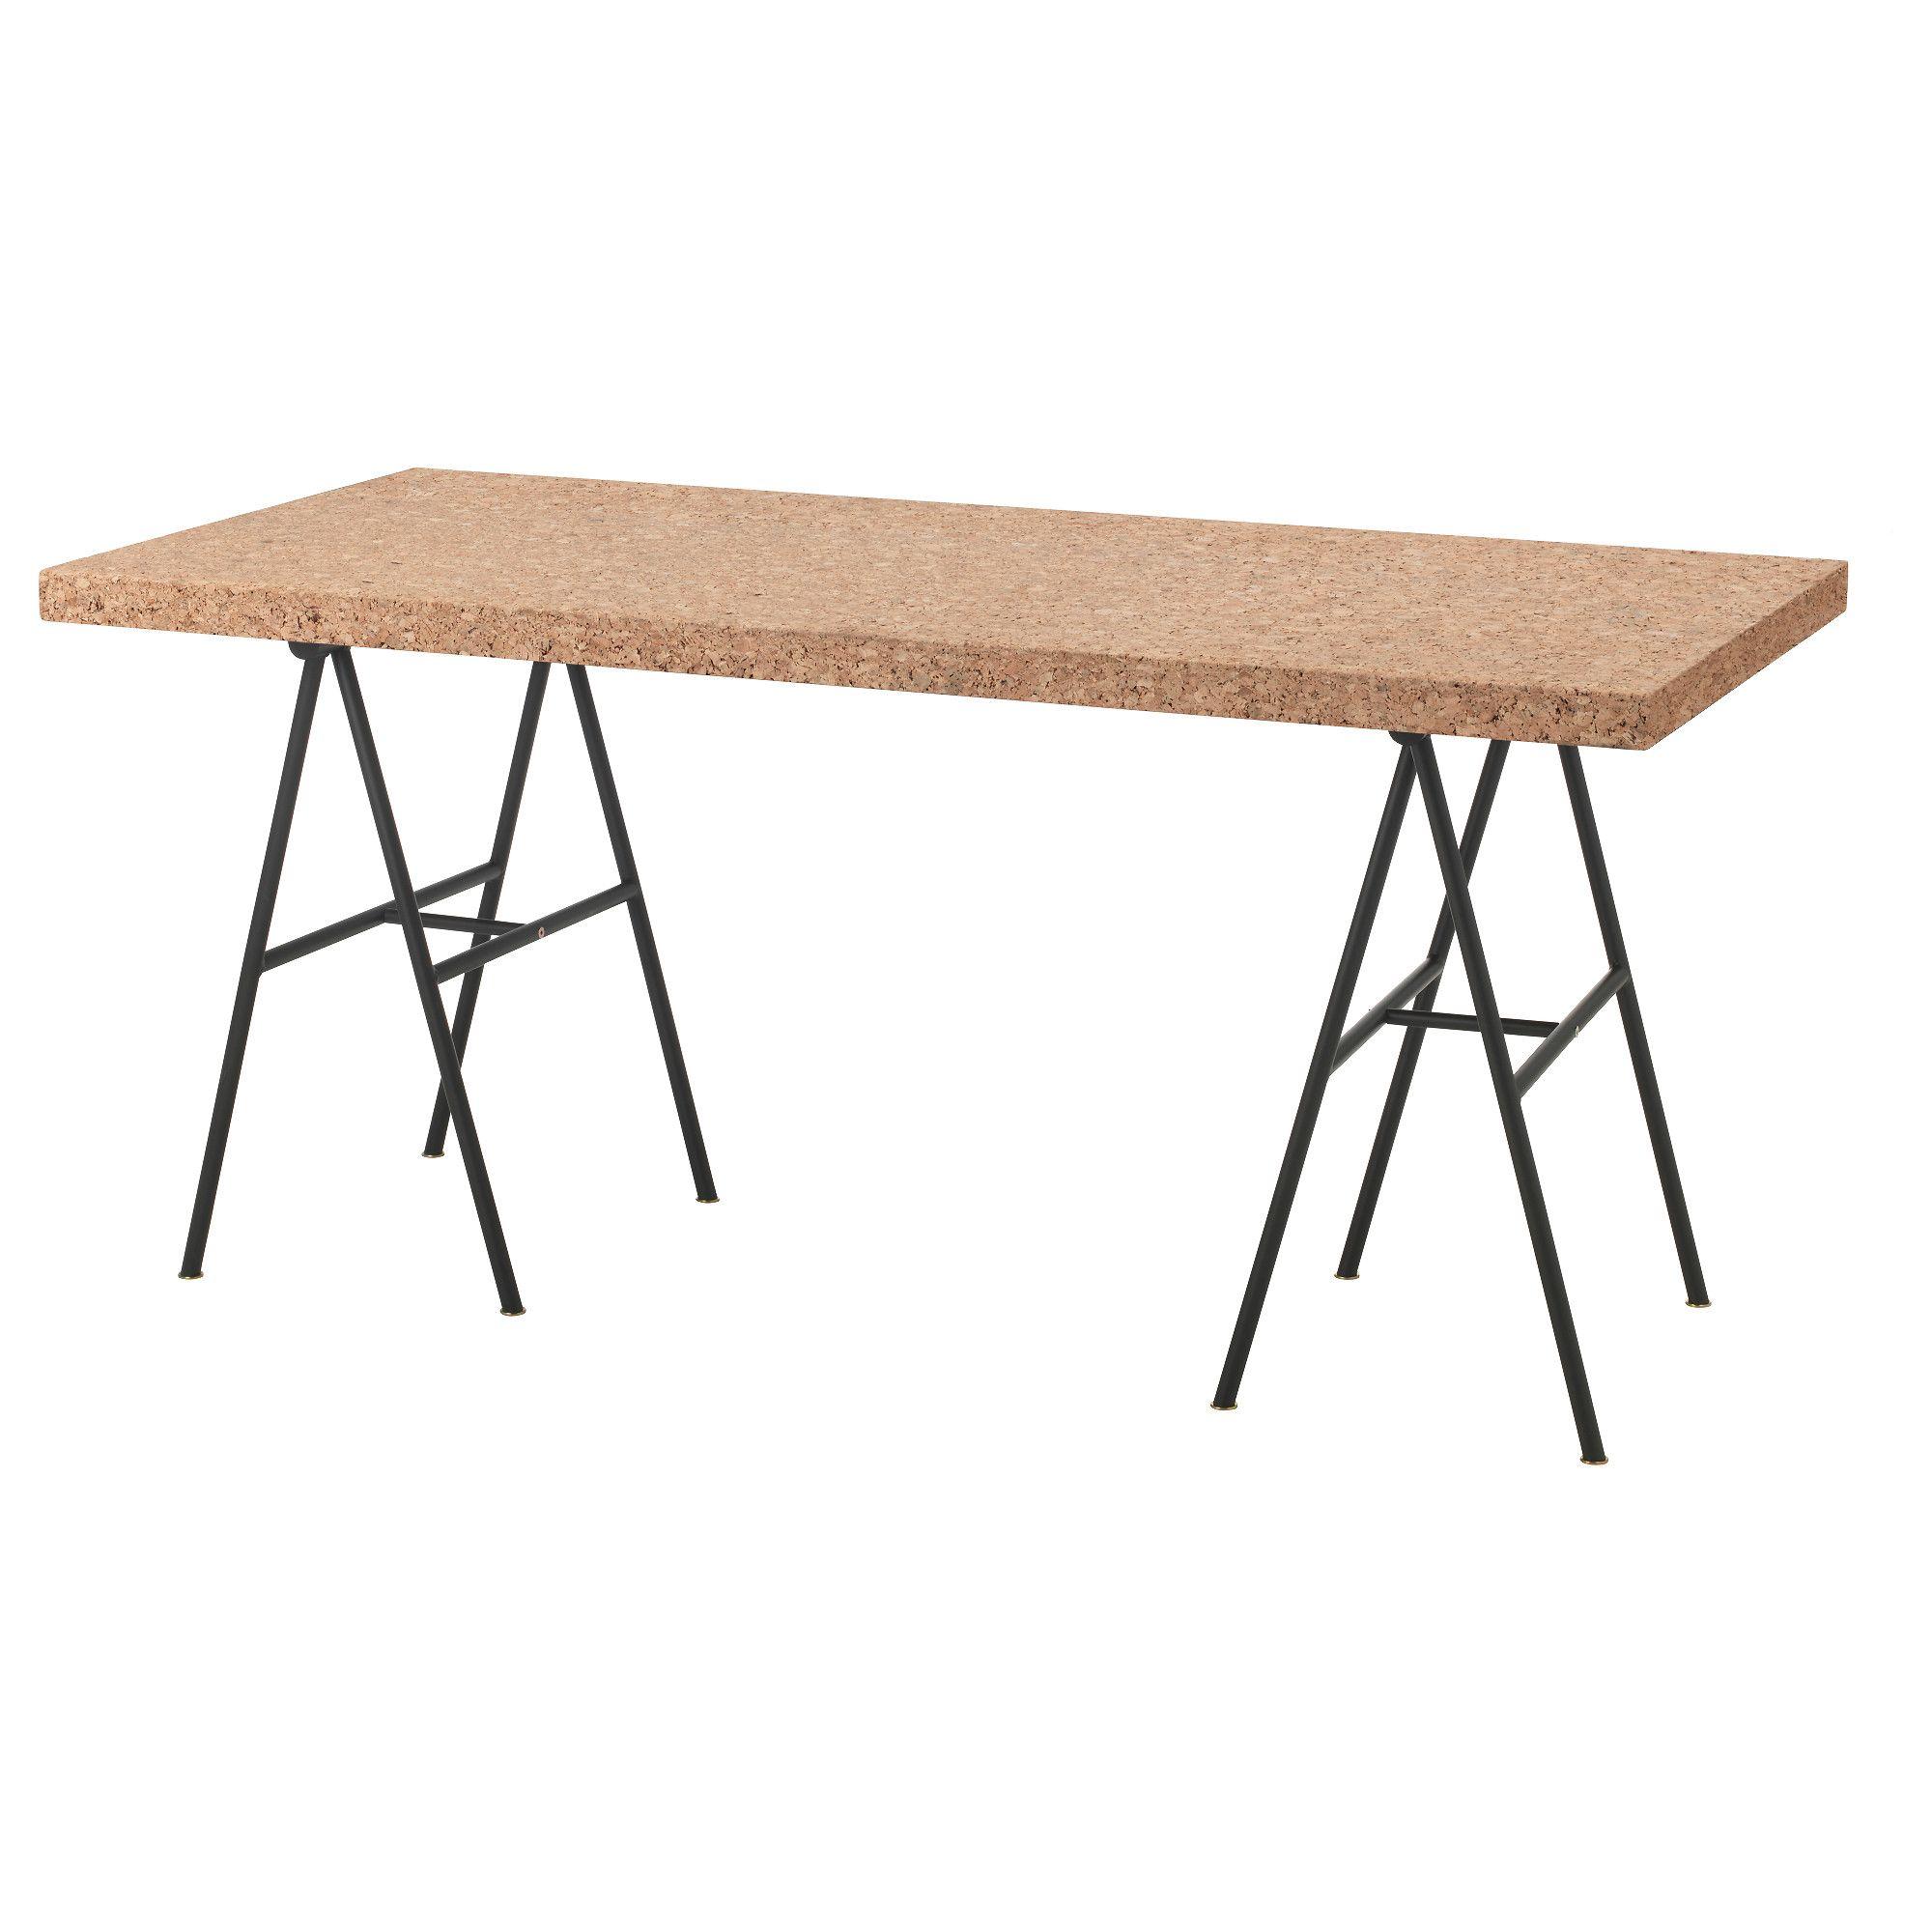 Ikea Nederland - Interieur & Meubelen Online Bestellen  Ikea